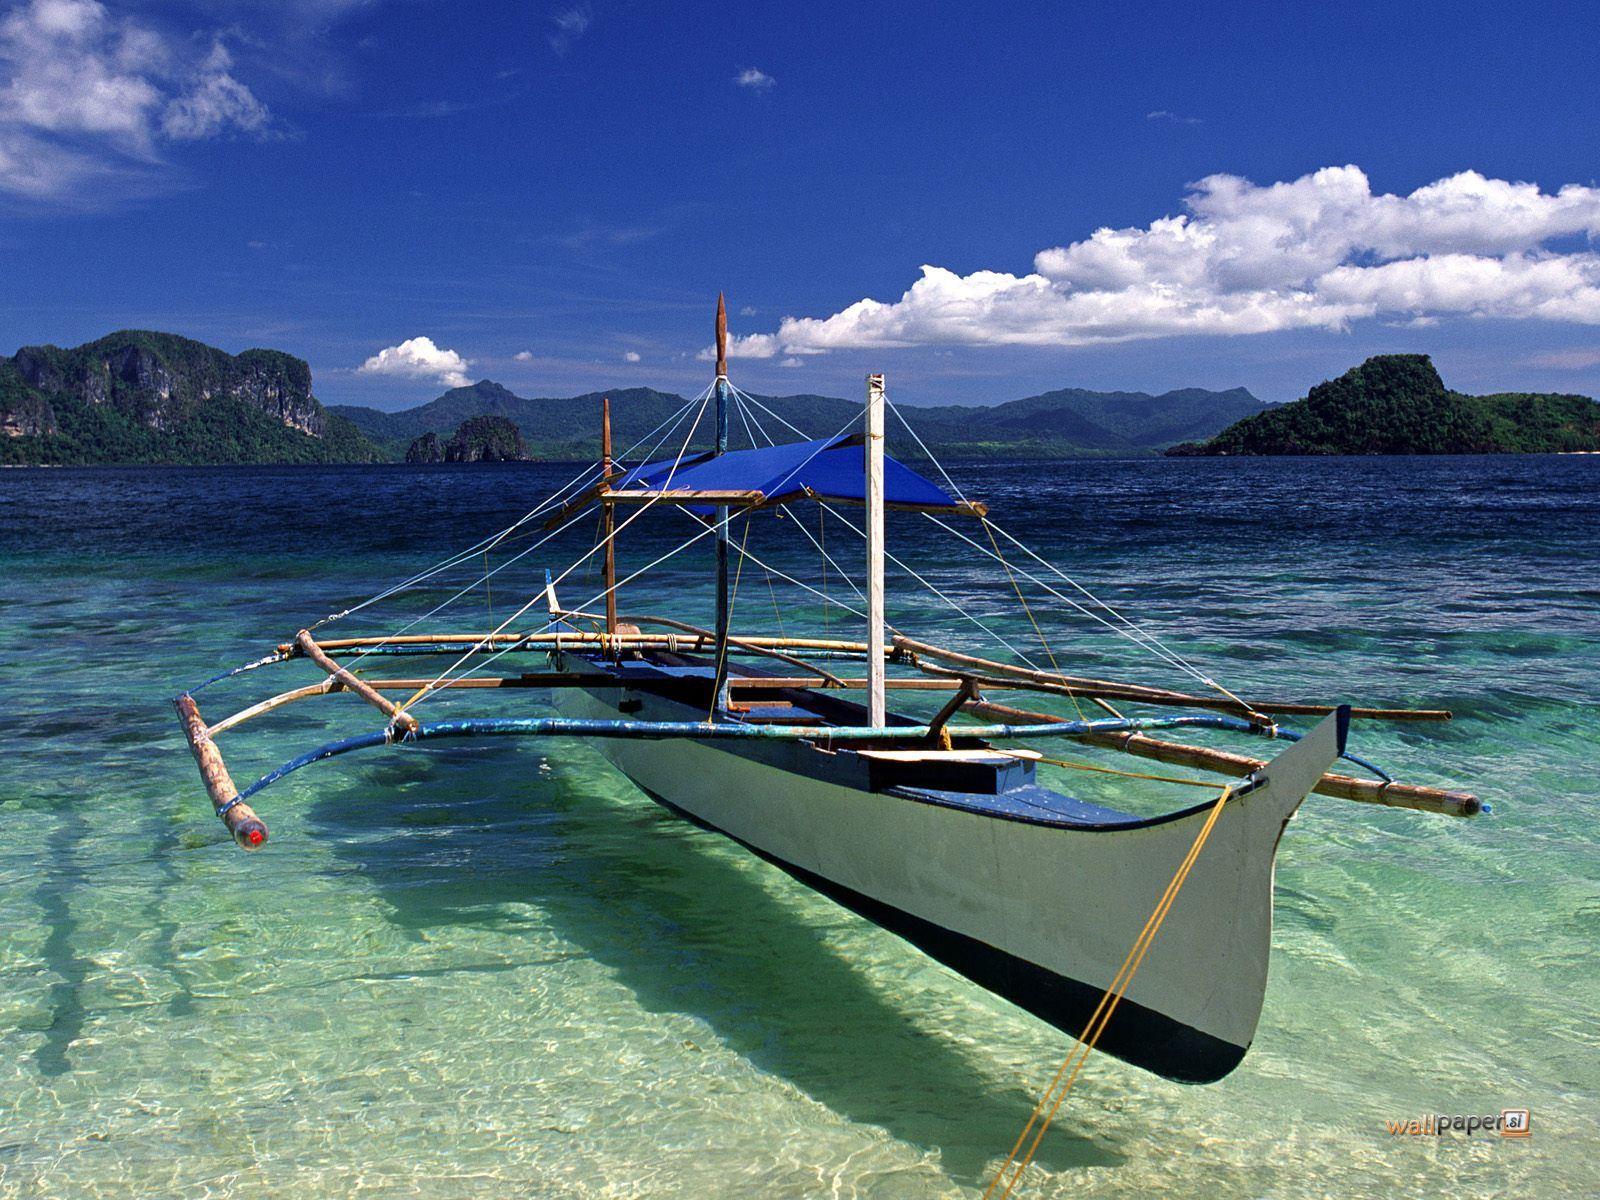 http://4.bp.blogspot.com/-igsD1ggU84w/TdUDyp67RXI/AAAAAAAADTs/pOH8H5hnA7E/s1600/Palawan-Island-Philippines-Wallpaper.jpg